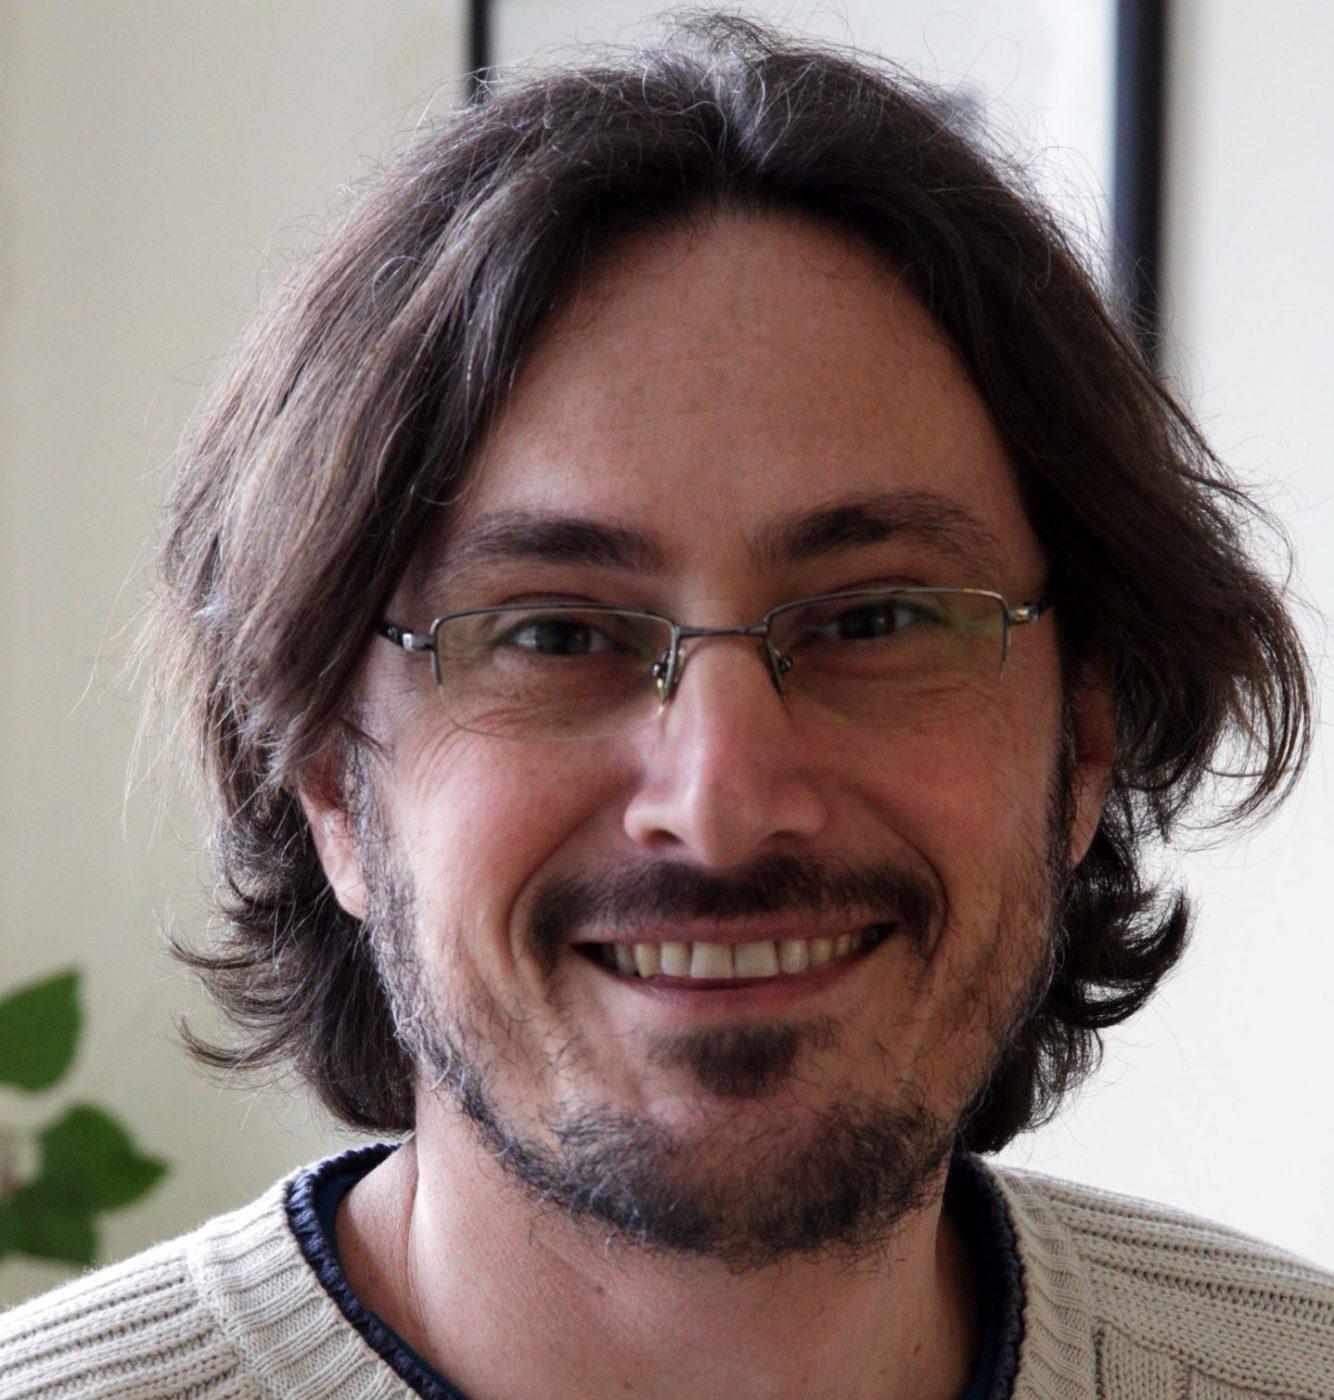 Giuseppe Muscogiuri